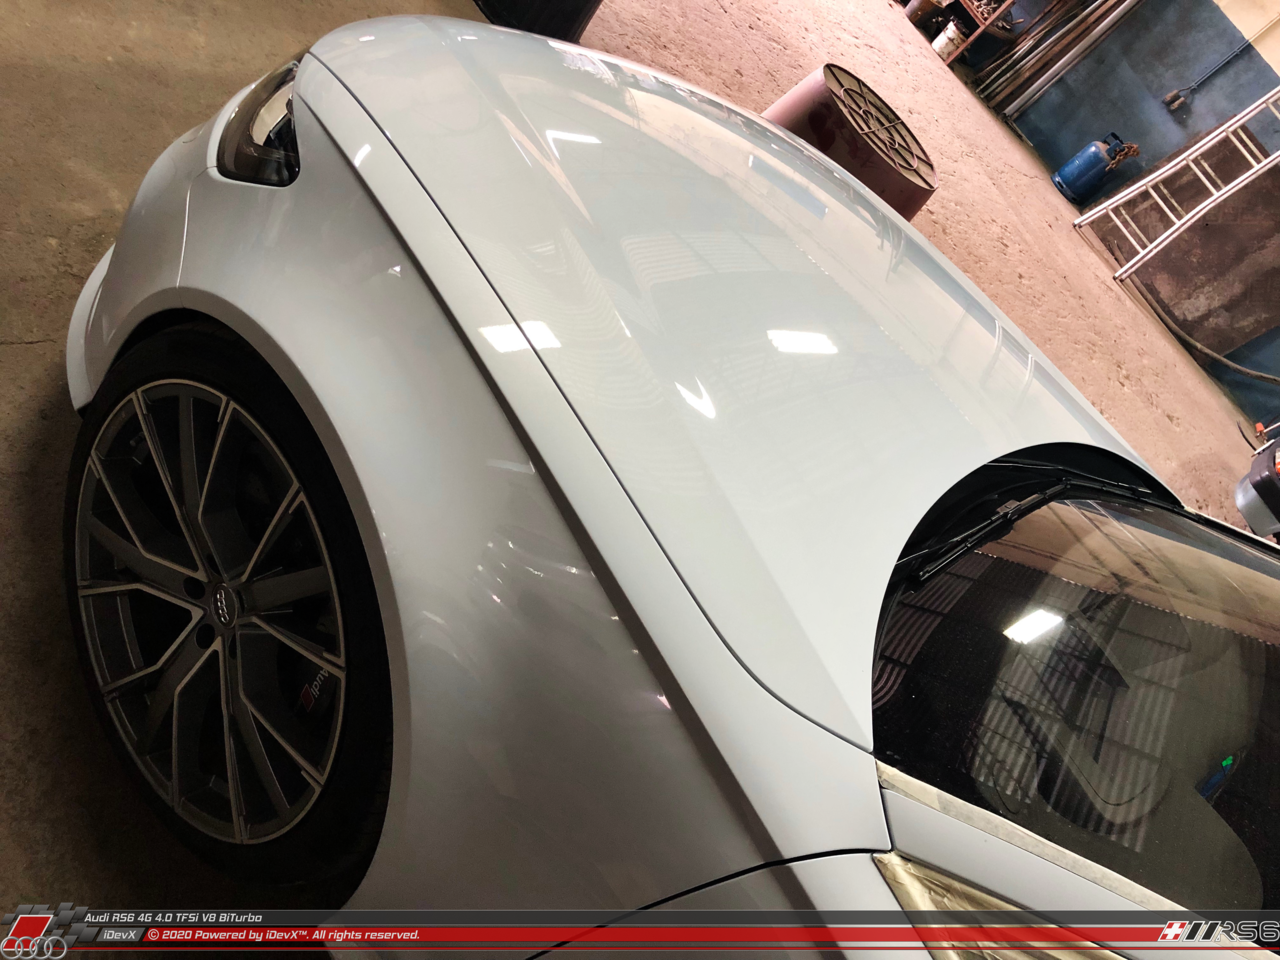 05_08.2019_Audi-RS6_iDevX_017.png